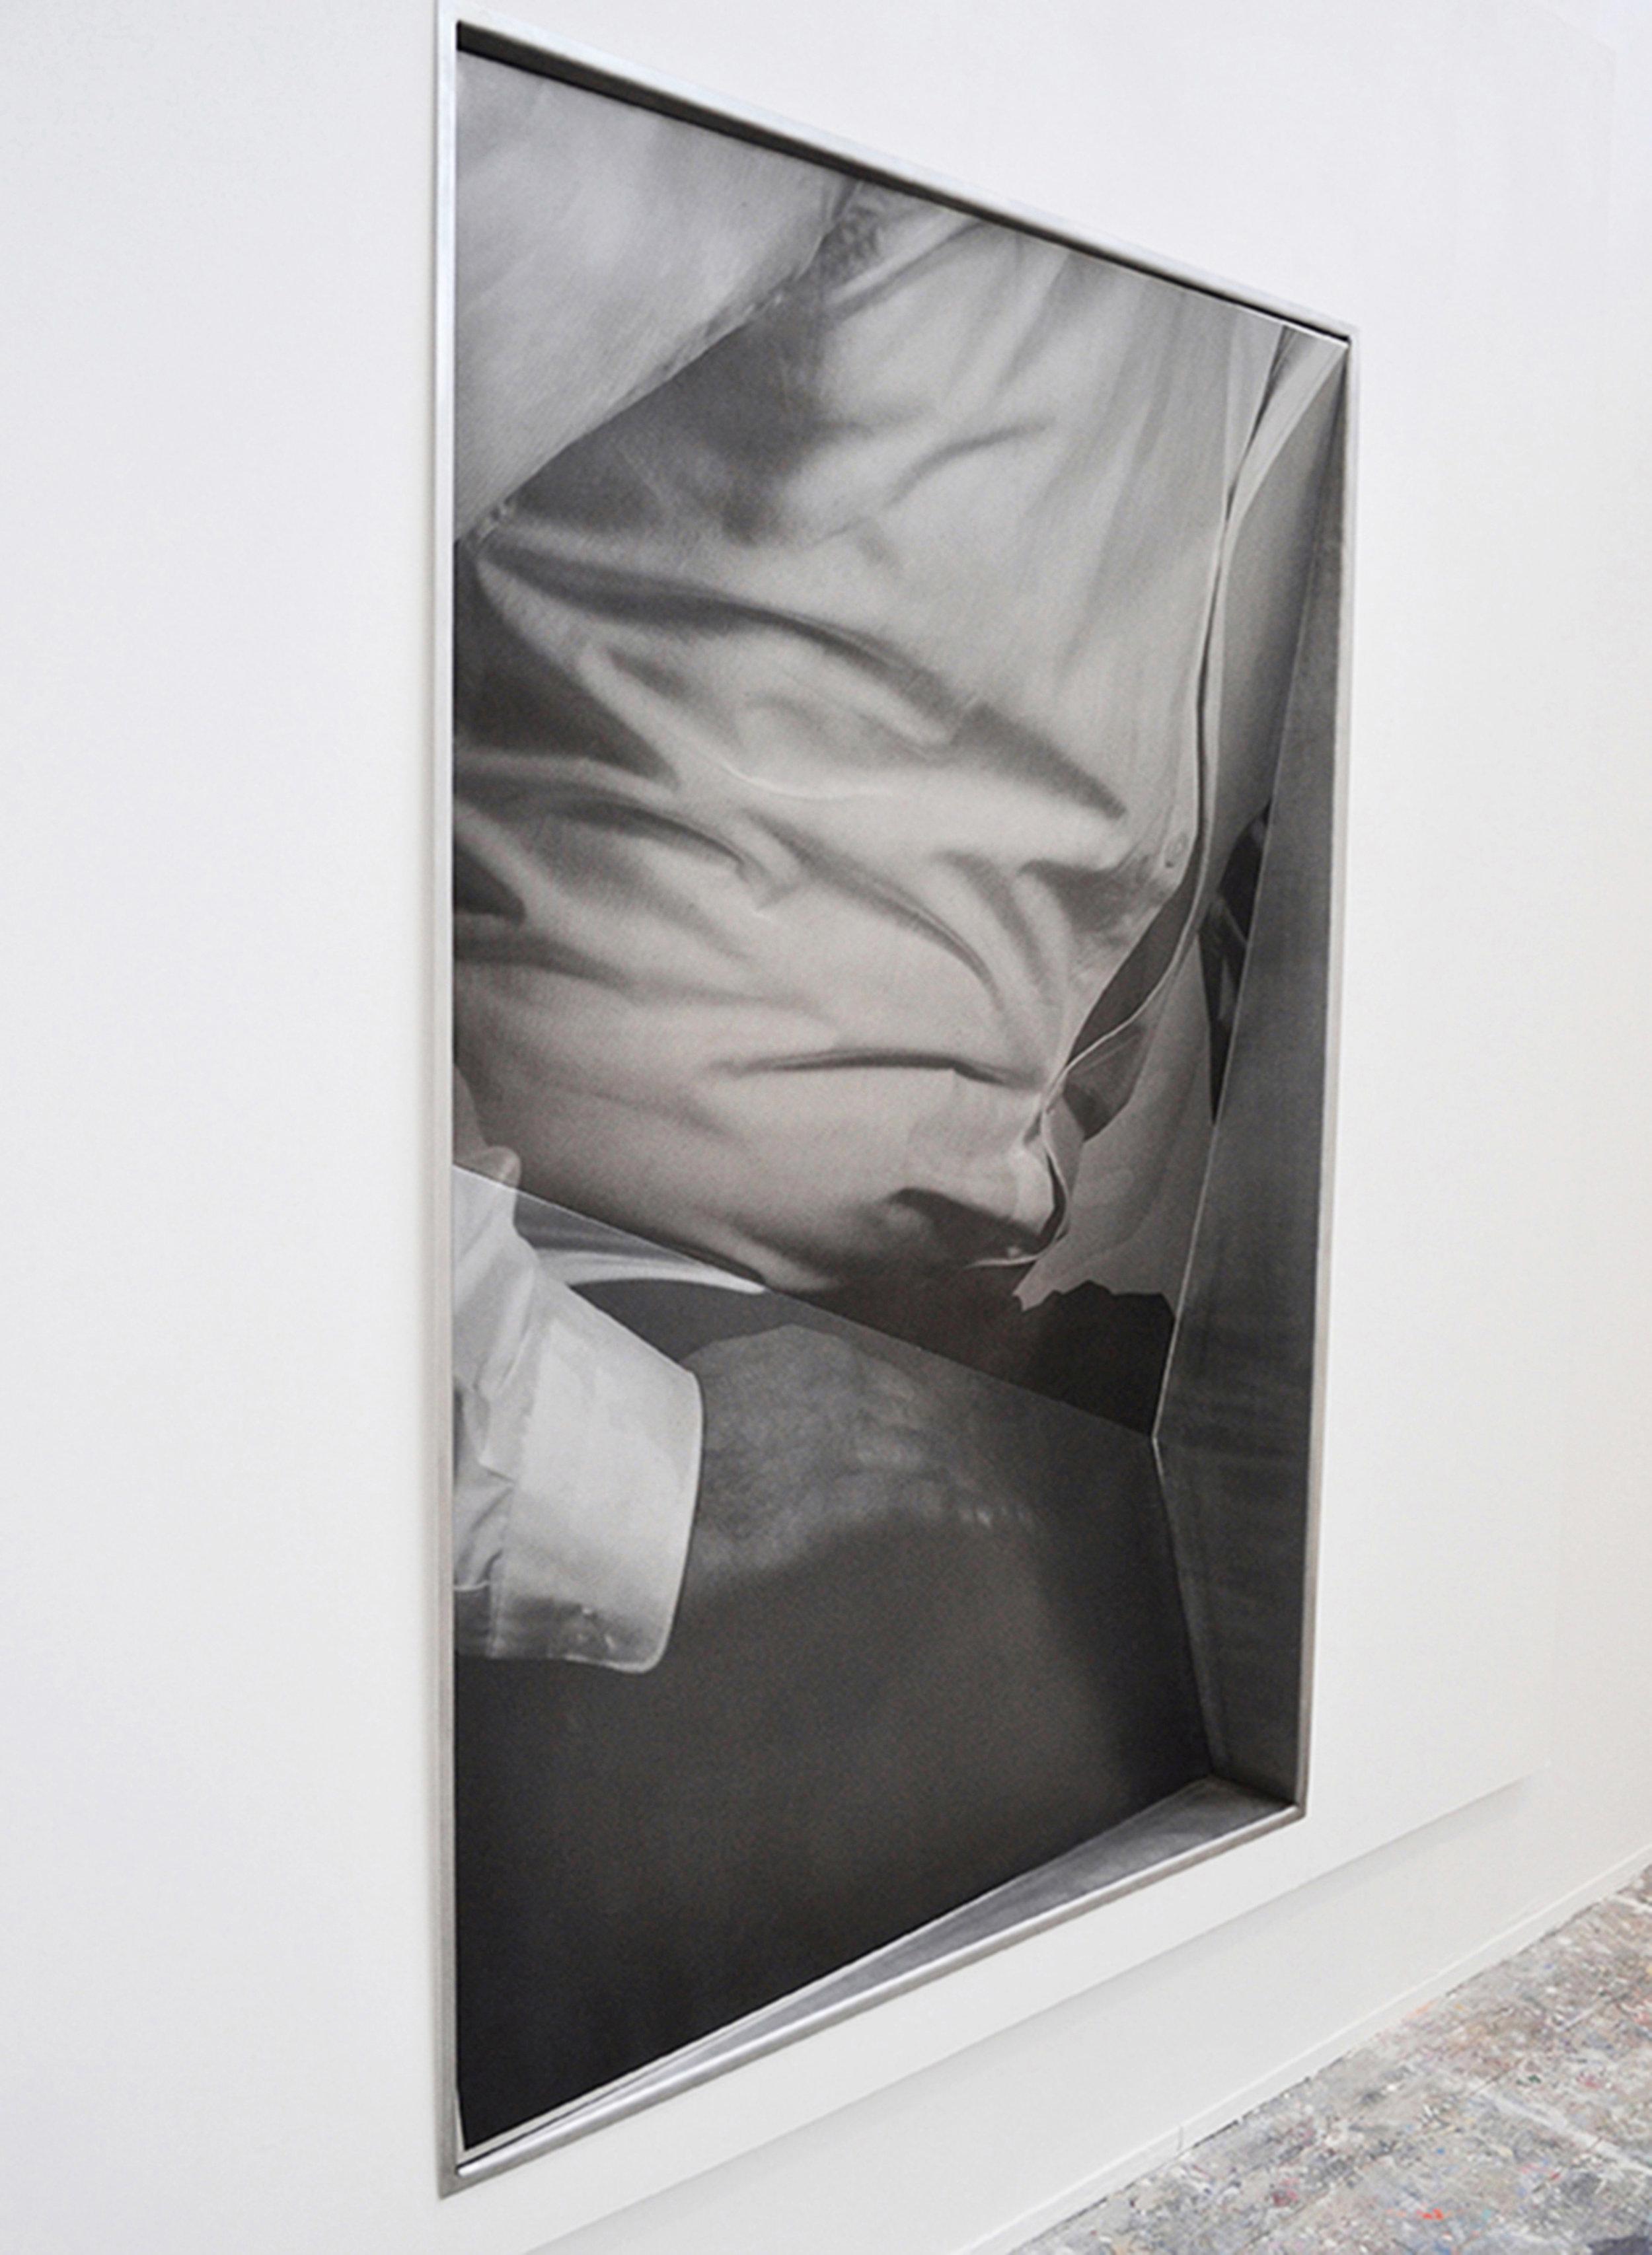 Unbuttoned | 2016 | screen print on aluminium | 6ft x 4ft